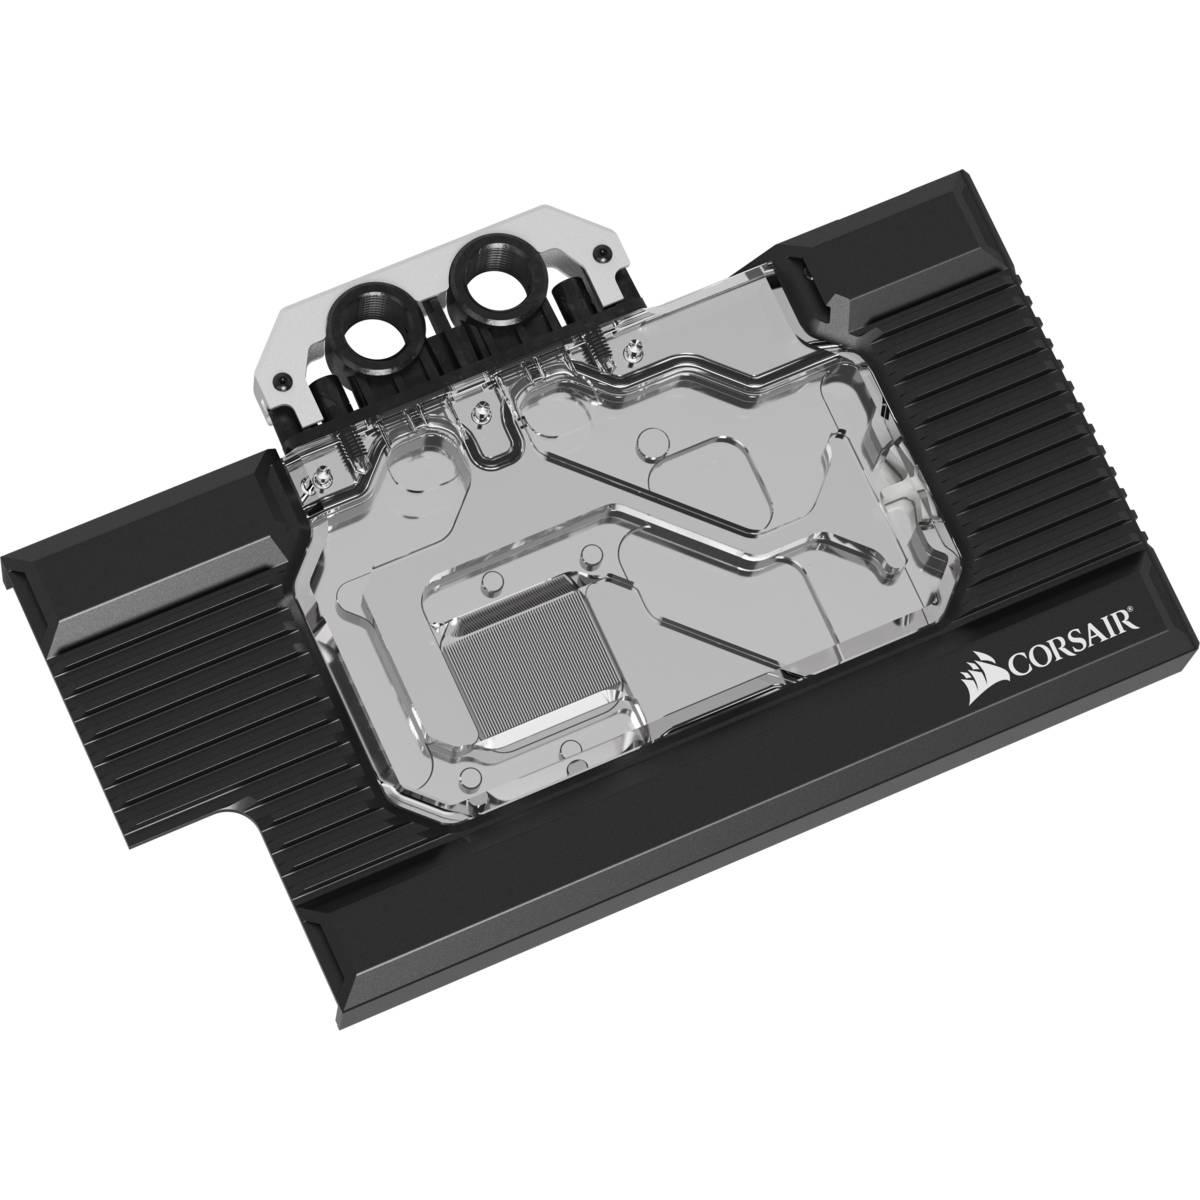 CORSAIR Hydro X Series XG7 RGB 20-SERIES GPU Water Block (2070 FE)